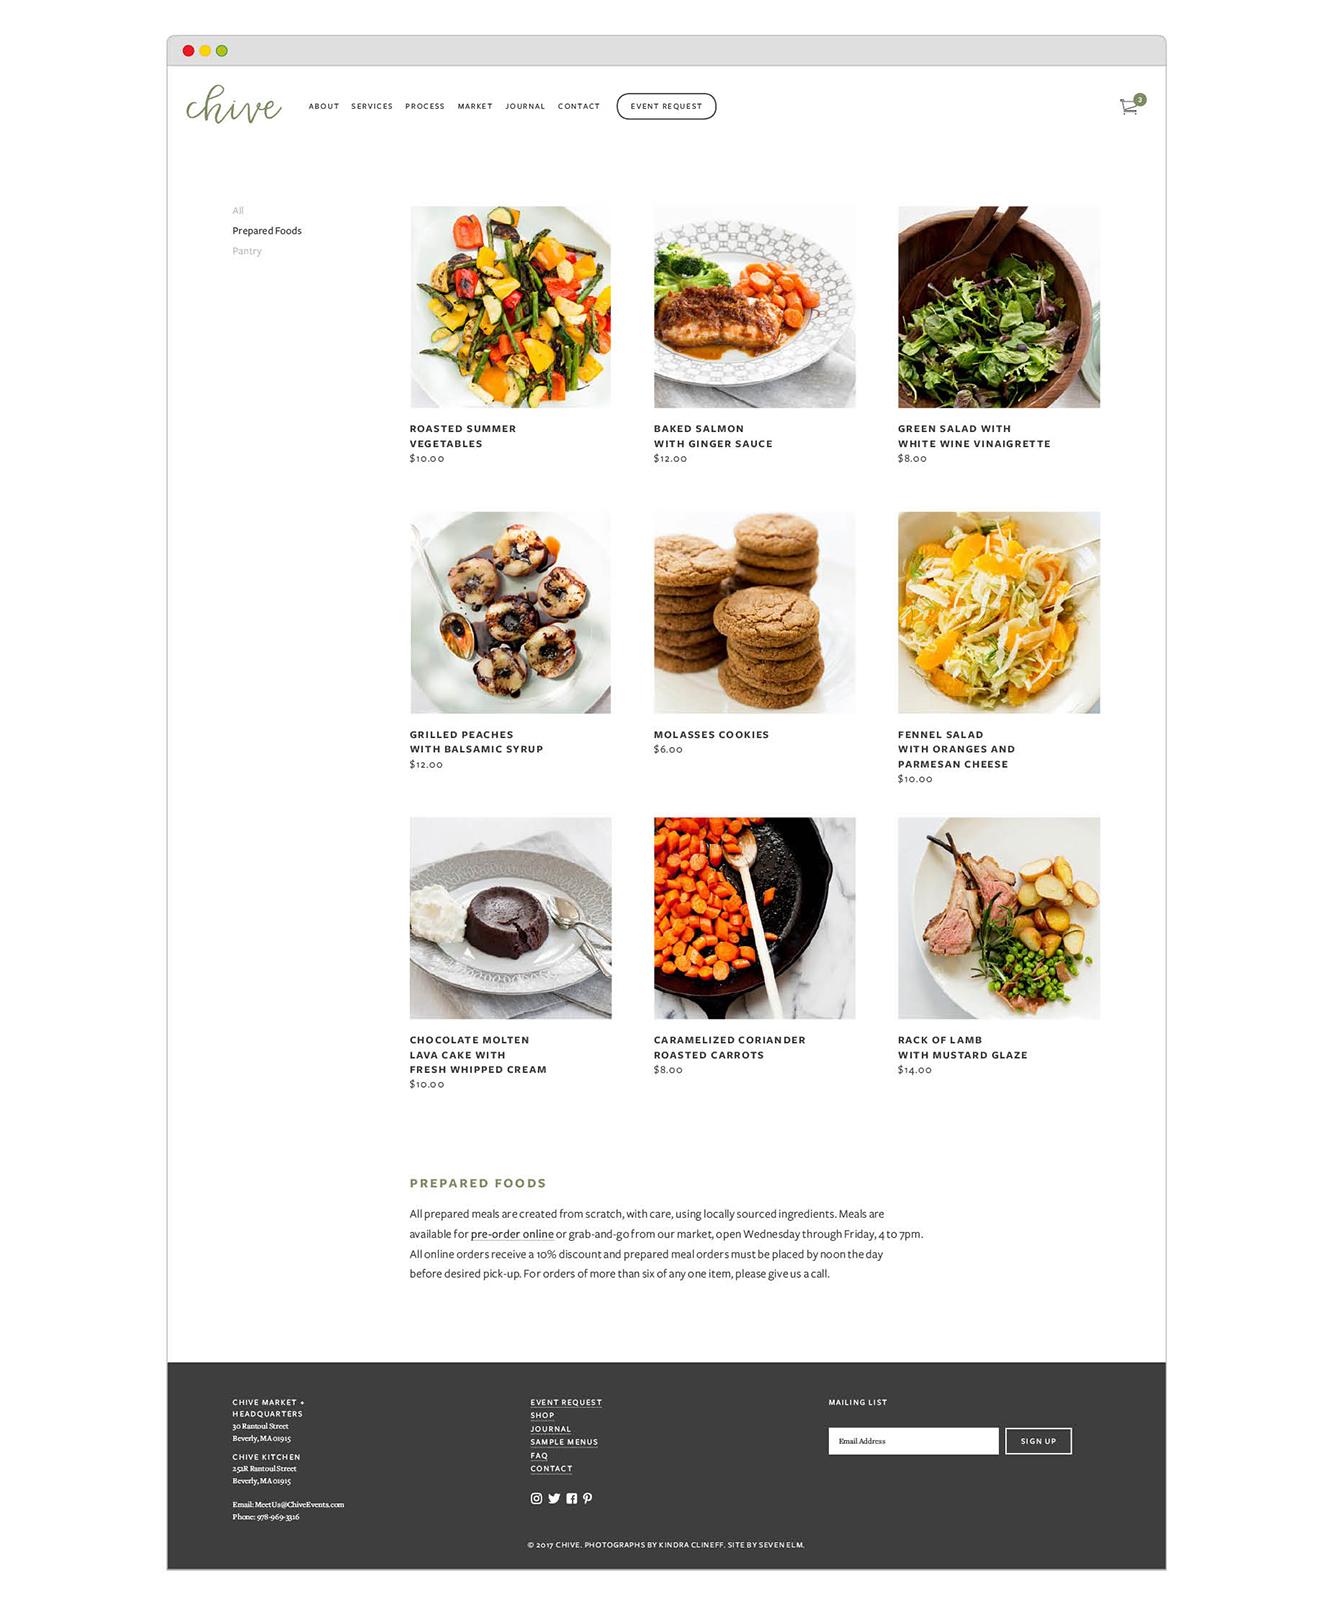 Chive_Website_Market.jpg